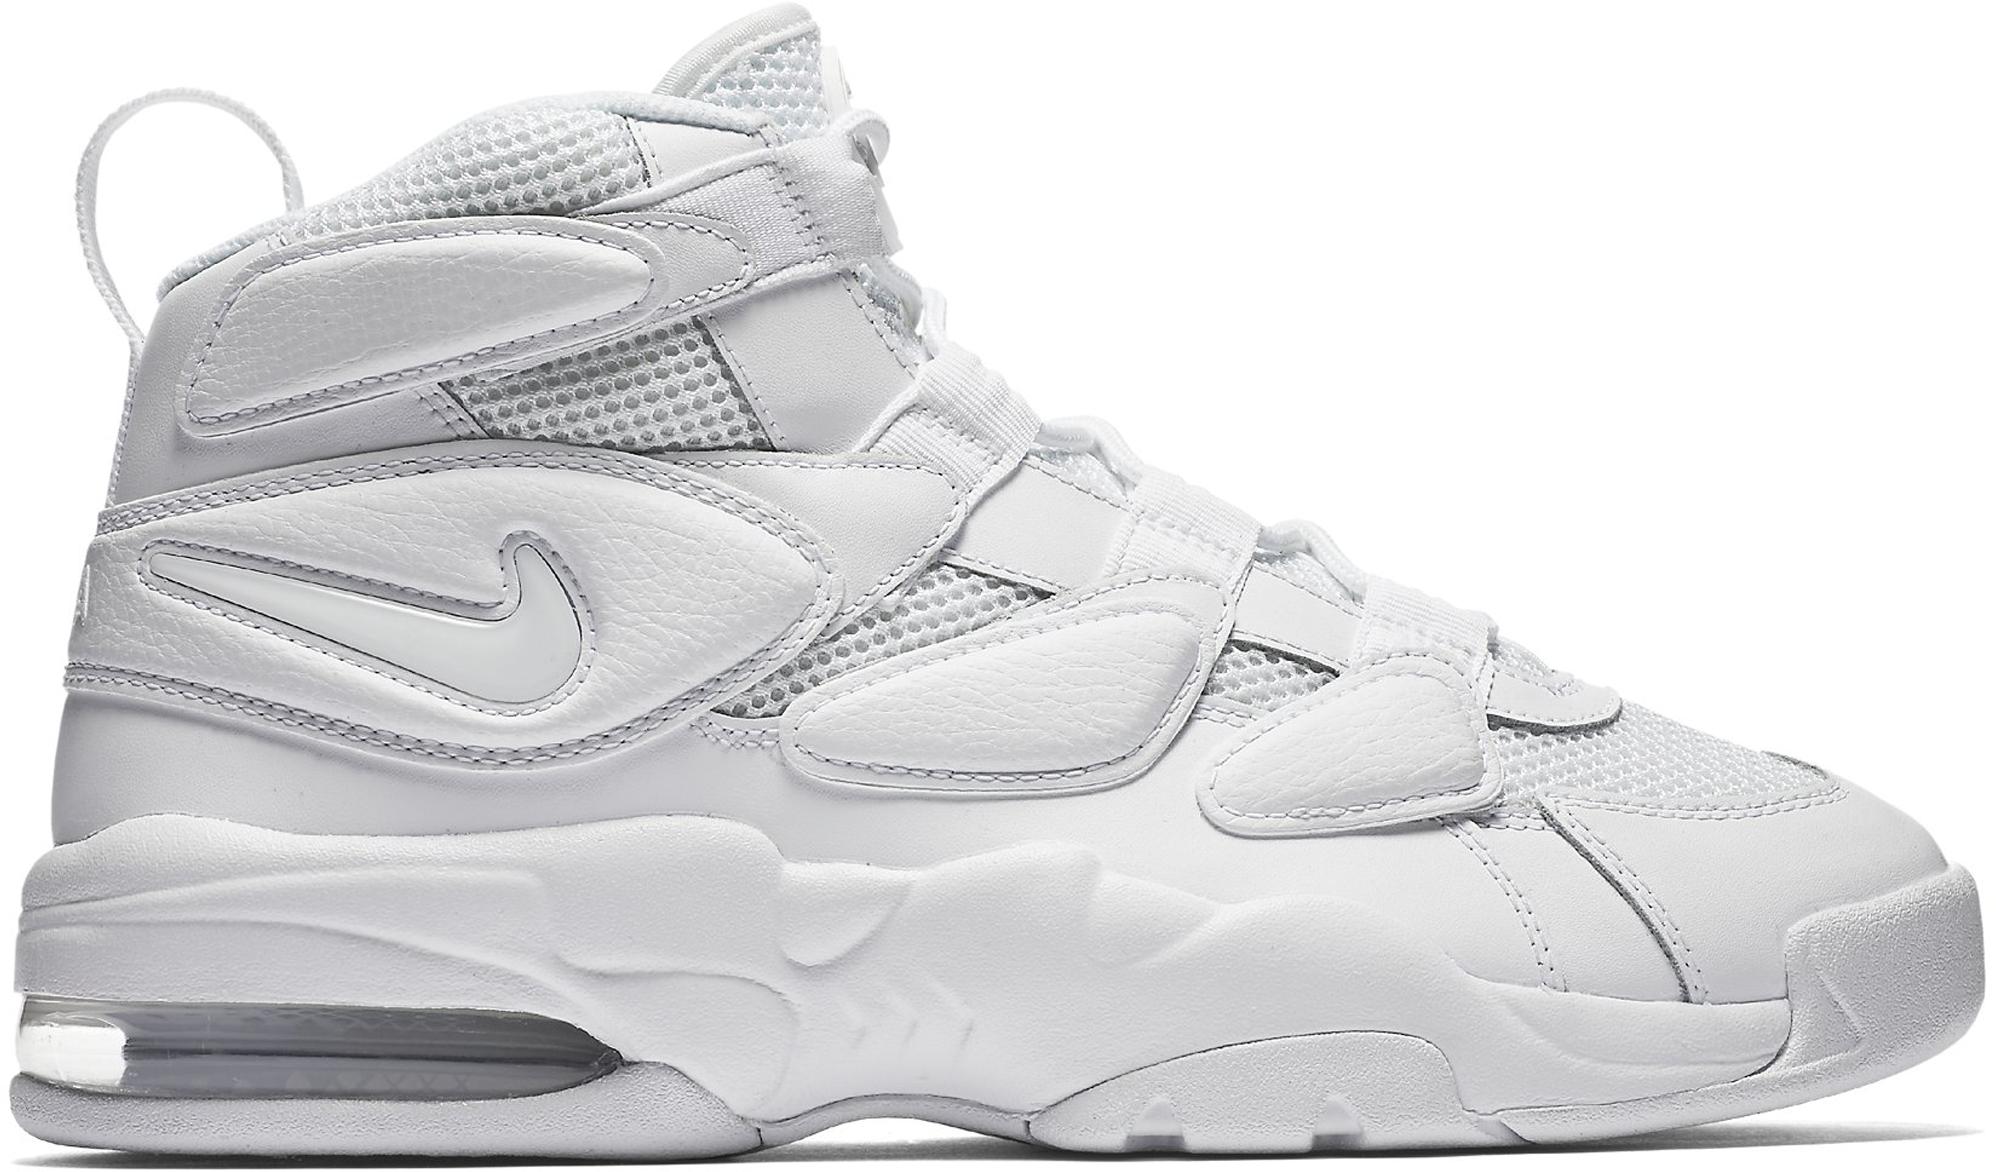 Nike Air Max 2 Uptempo 94 Triple White